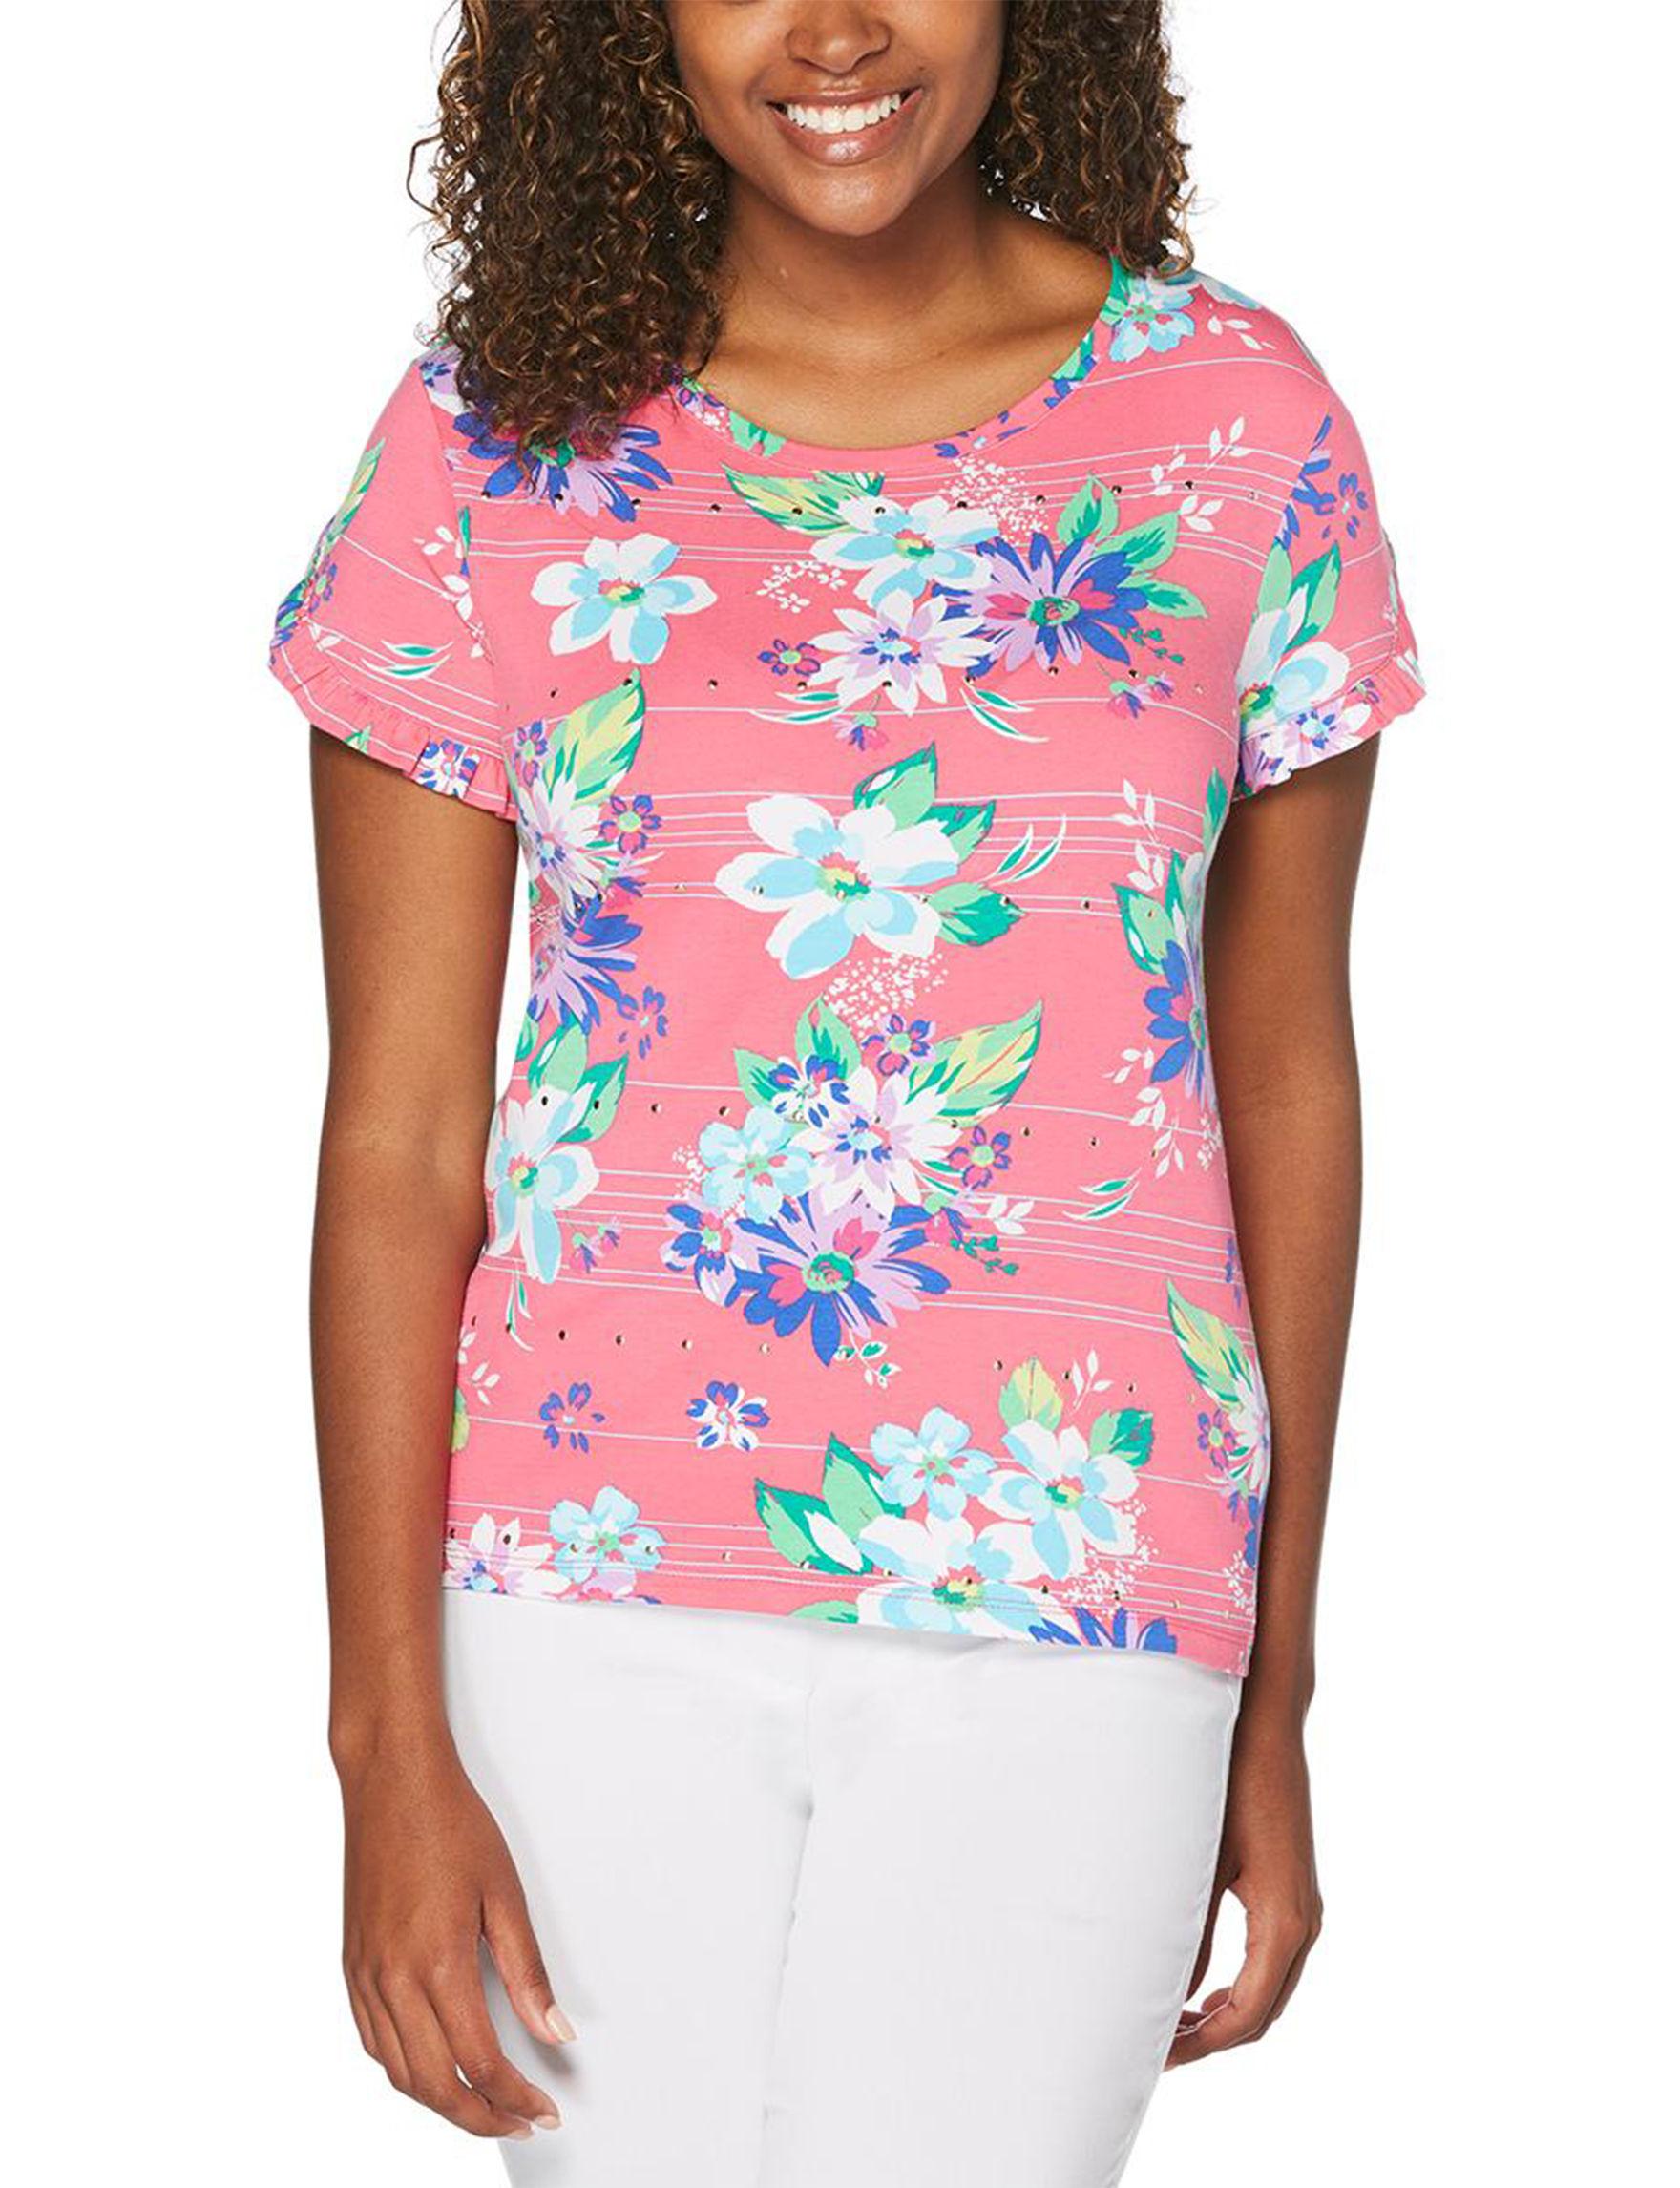 Rafaella Pink Floral Shirts & Blouses